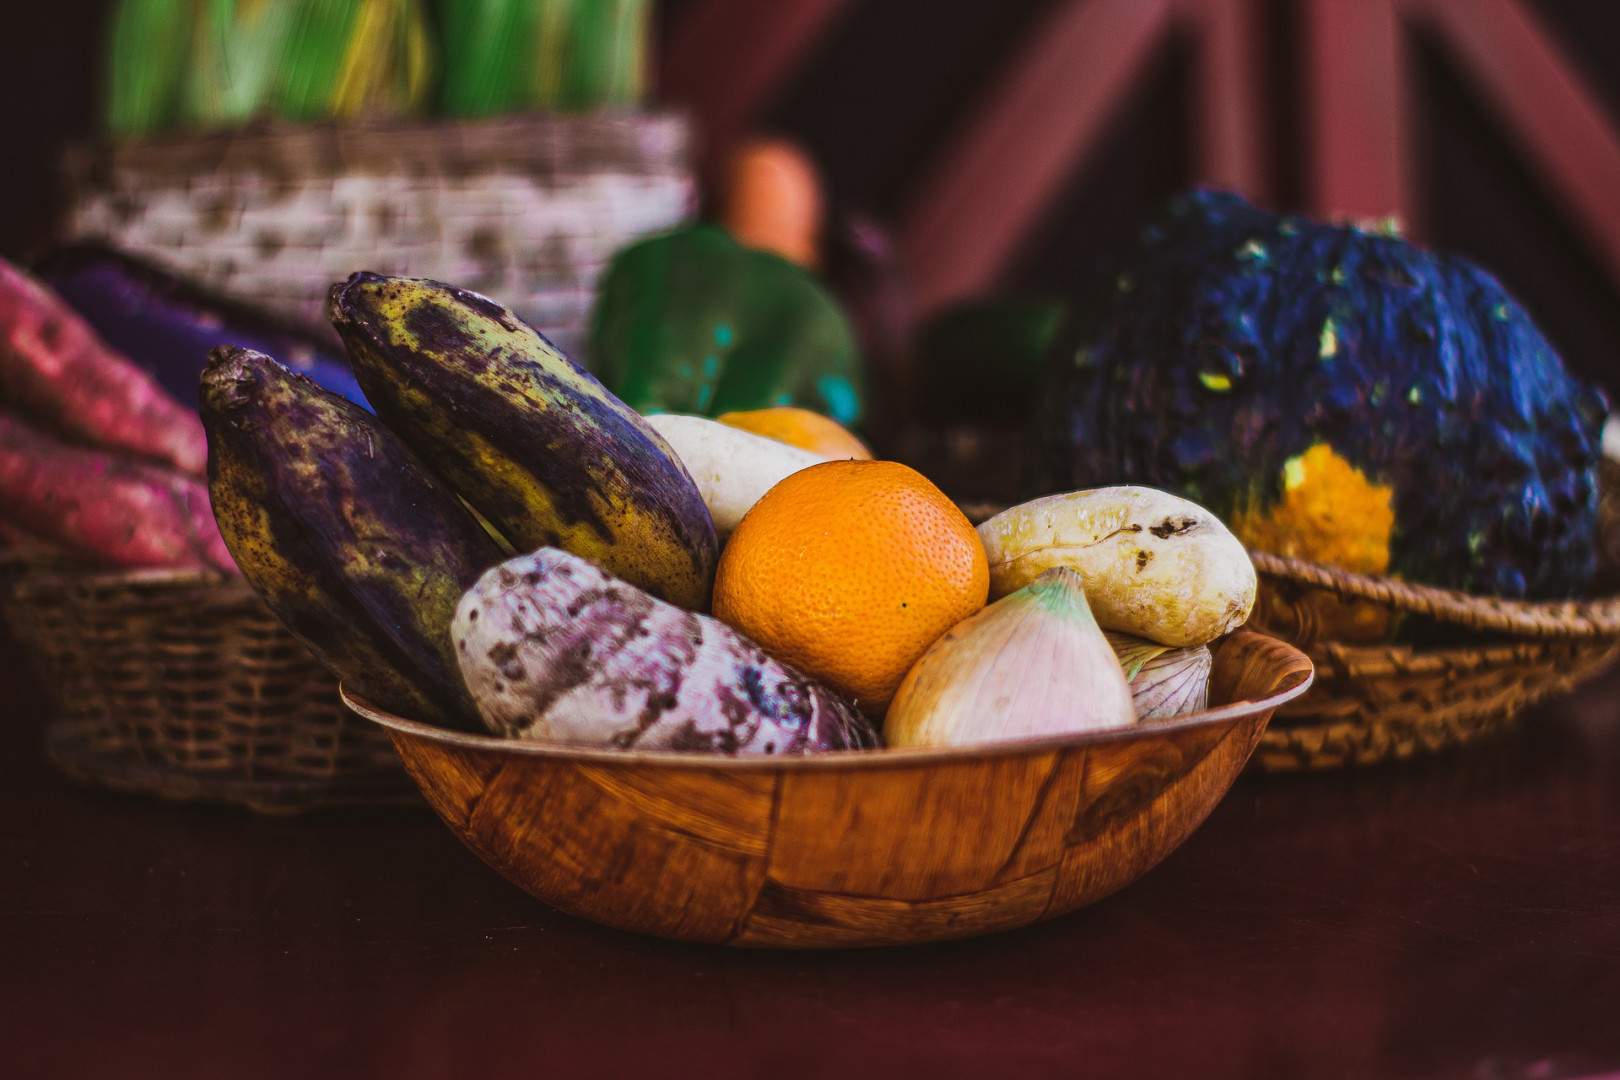 food waste, reduce food waste, family advice, kitchen hacks